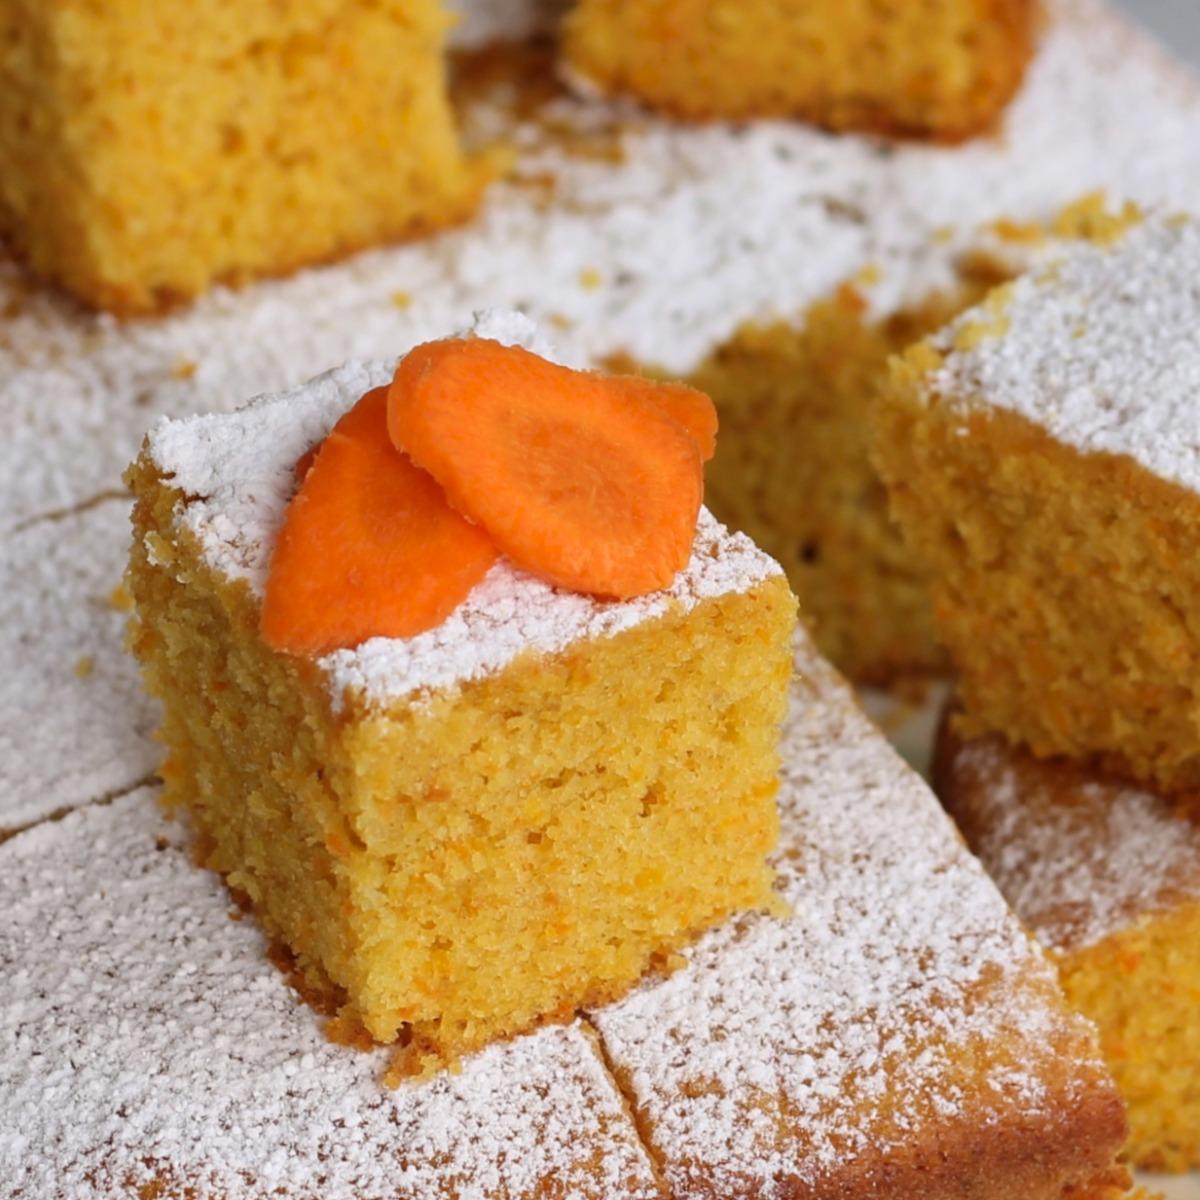 TORTA DI CAROTE SENZA BILANCIA ricetta torta al bicchiere